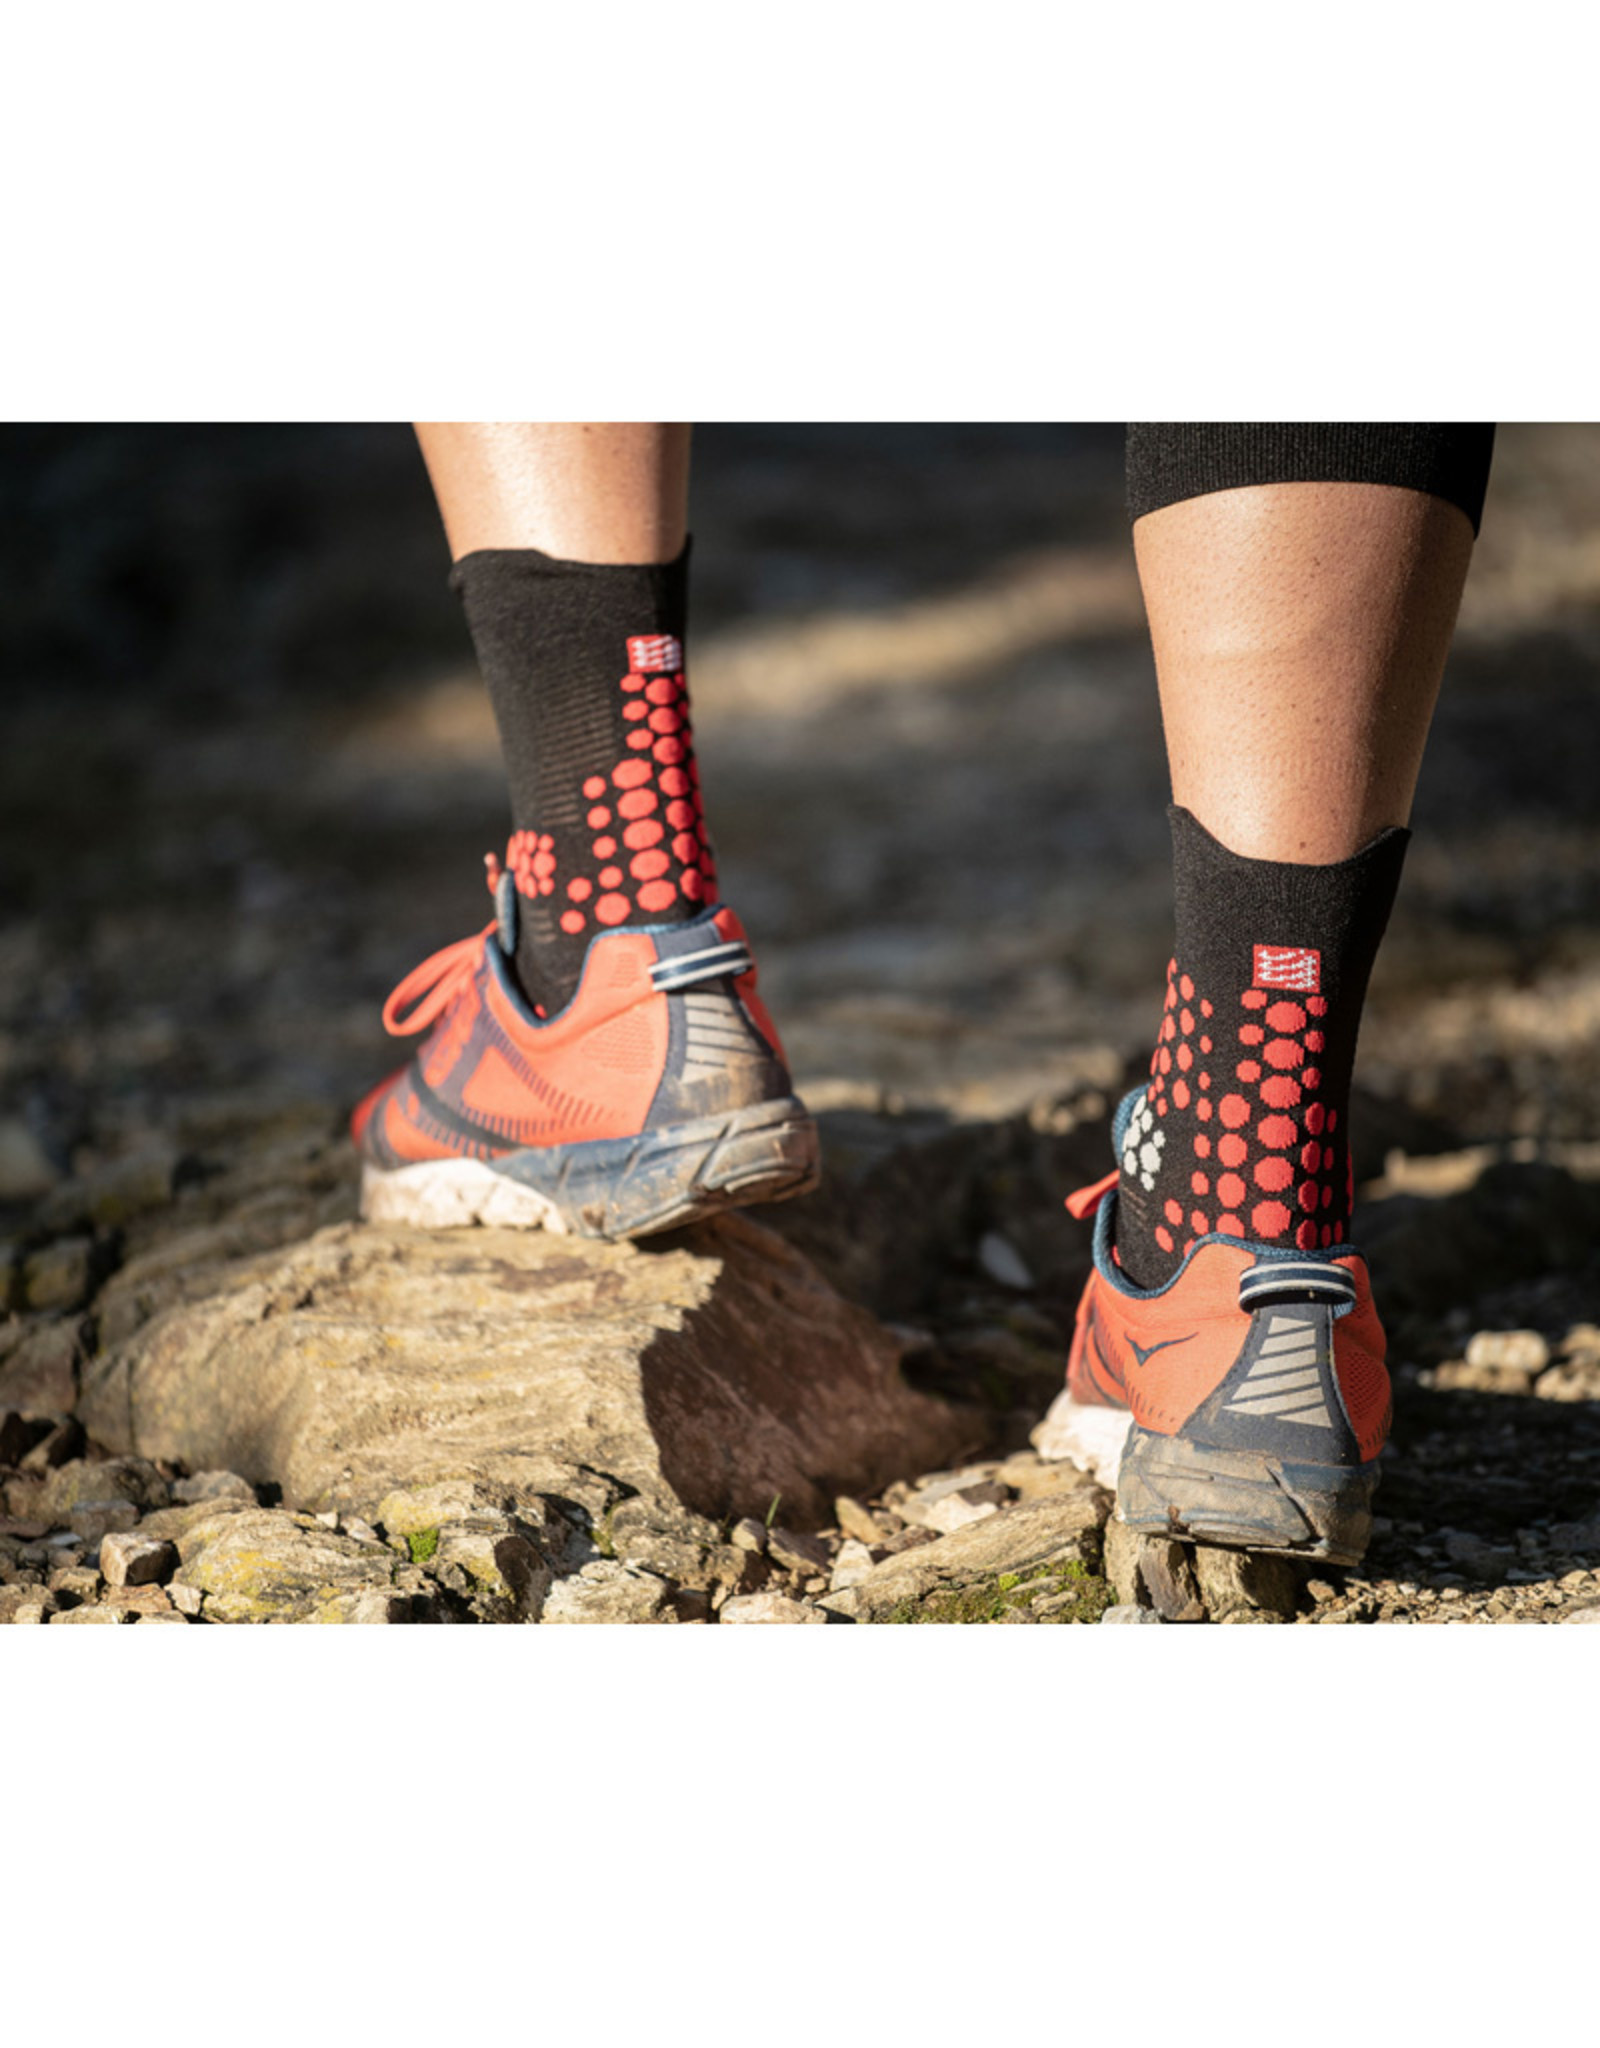 Compressport Pro Racing Socks V3.0 Trail Chaussettes De Running Haute - Noir/Rouge